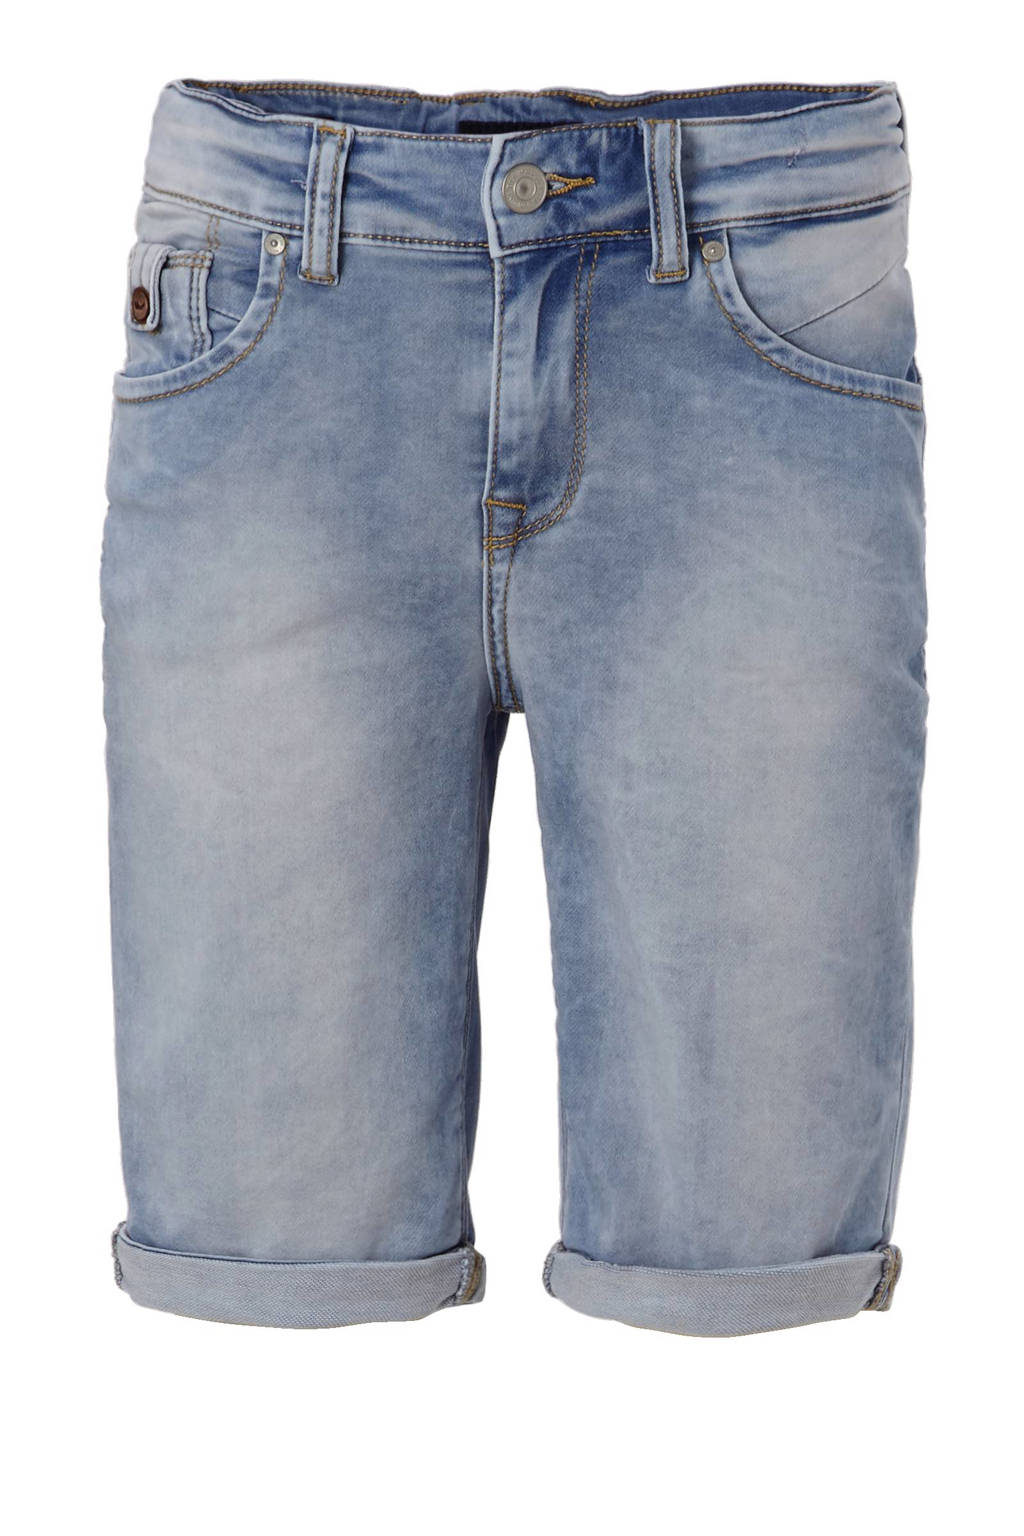 LTB jeans bermuda Anders, Light denim washed